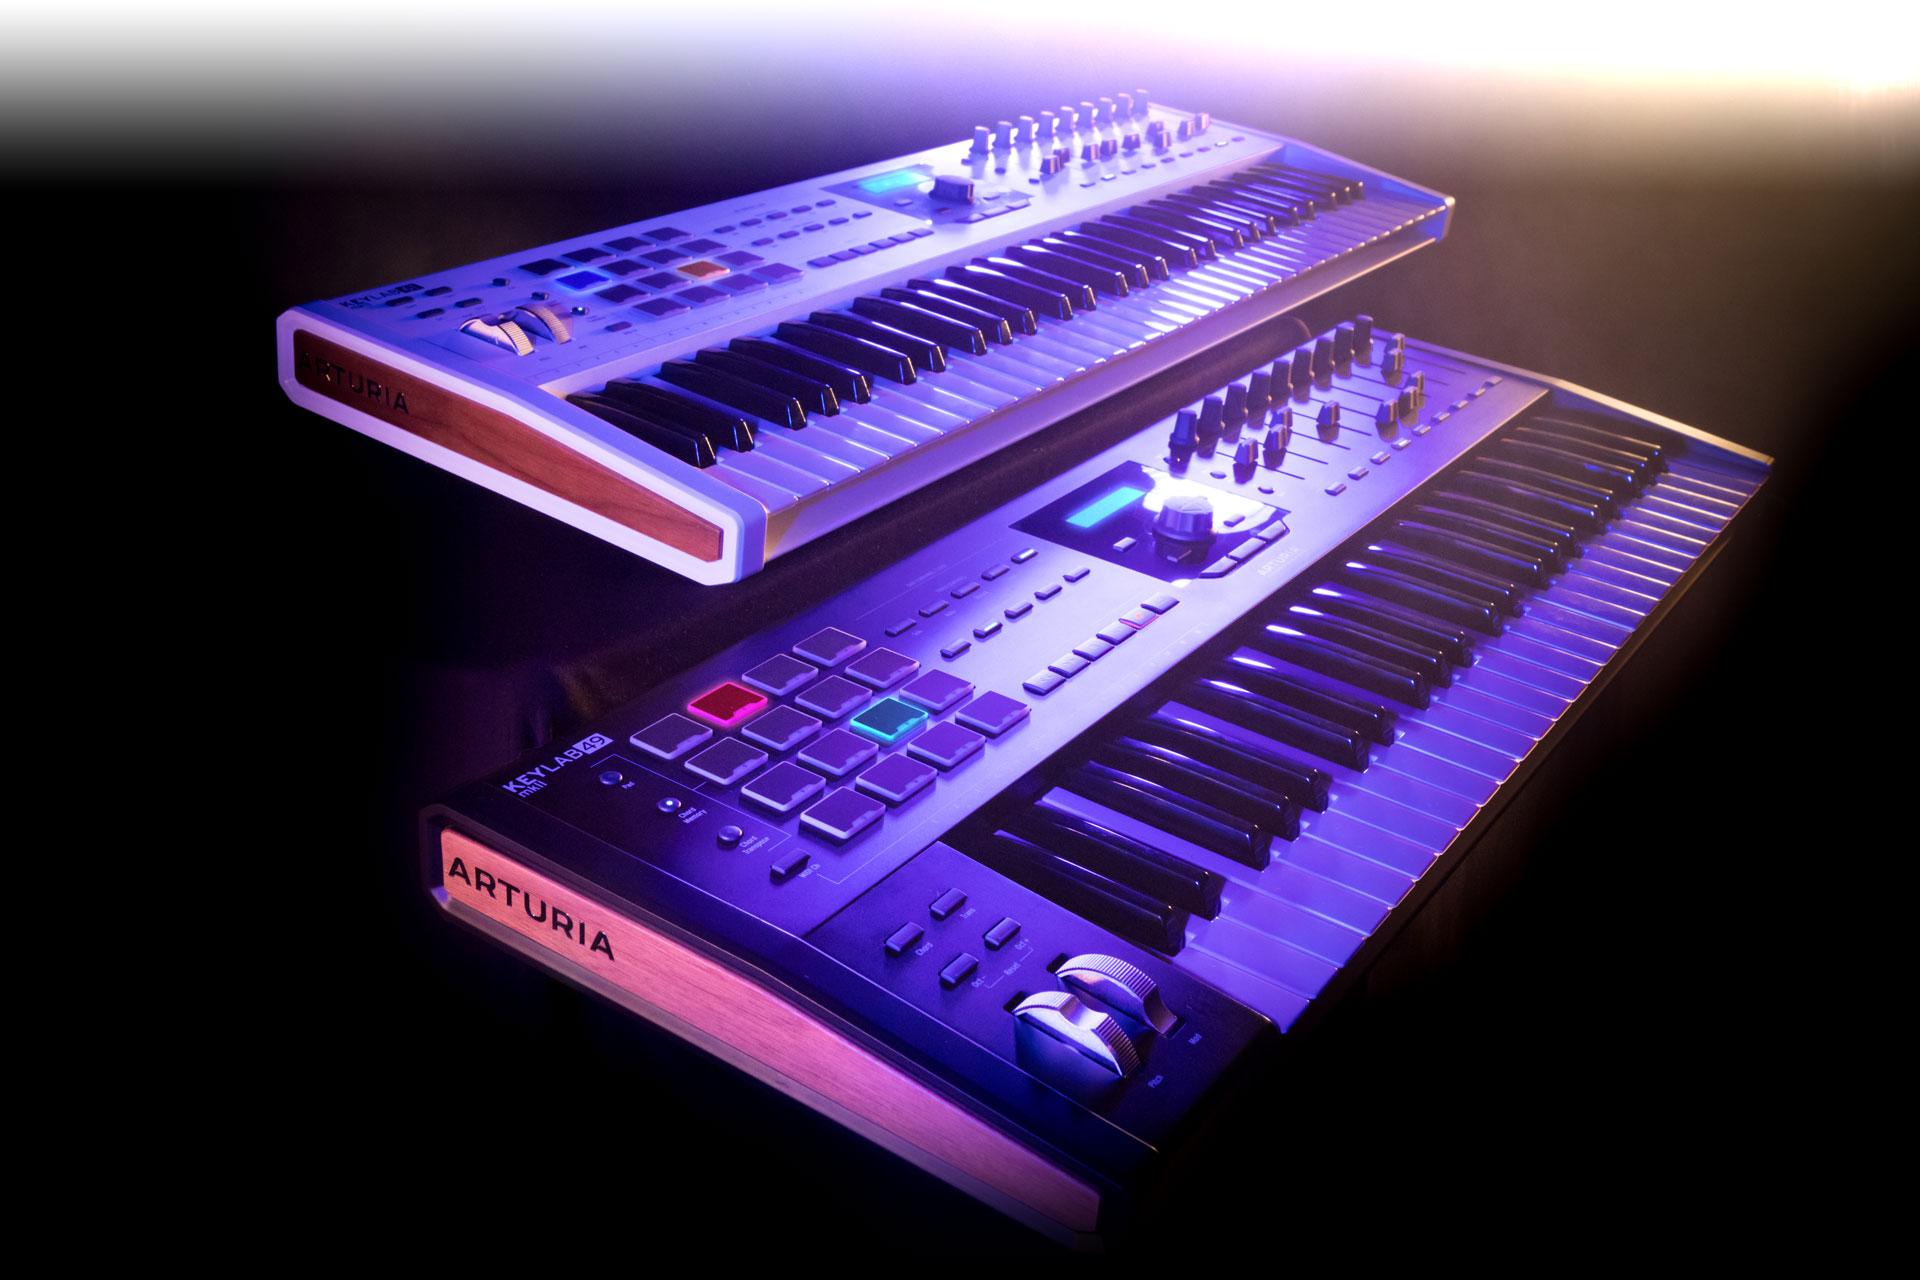 KeyLab MKⅡ - Arturia